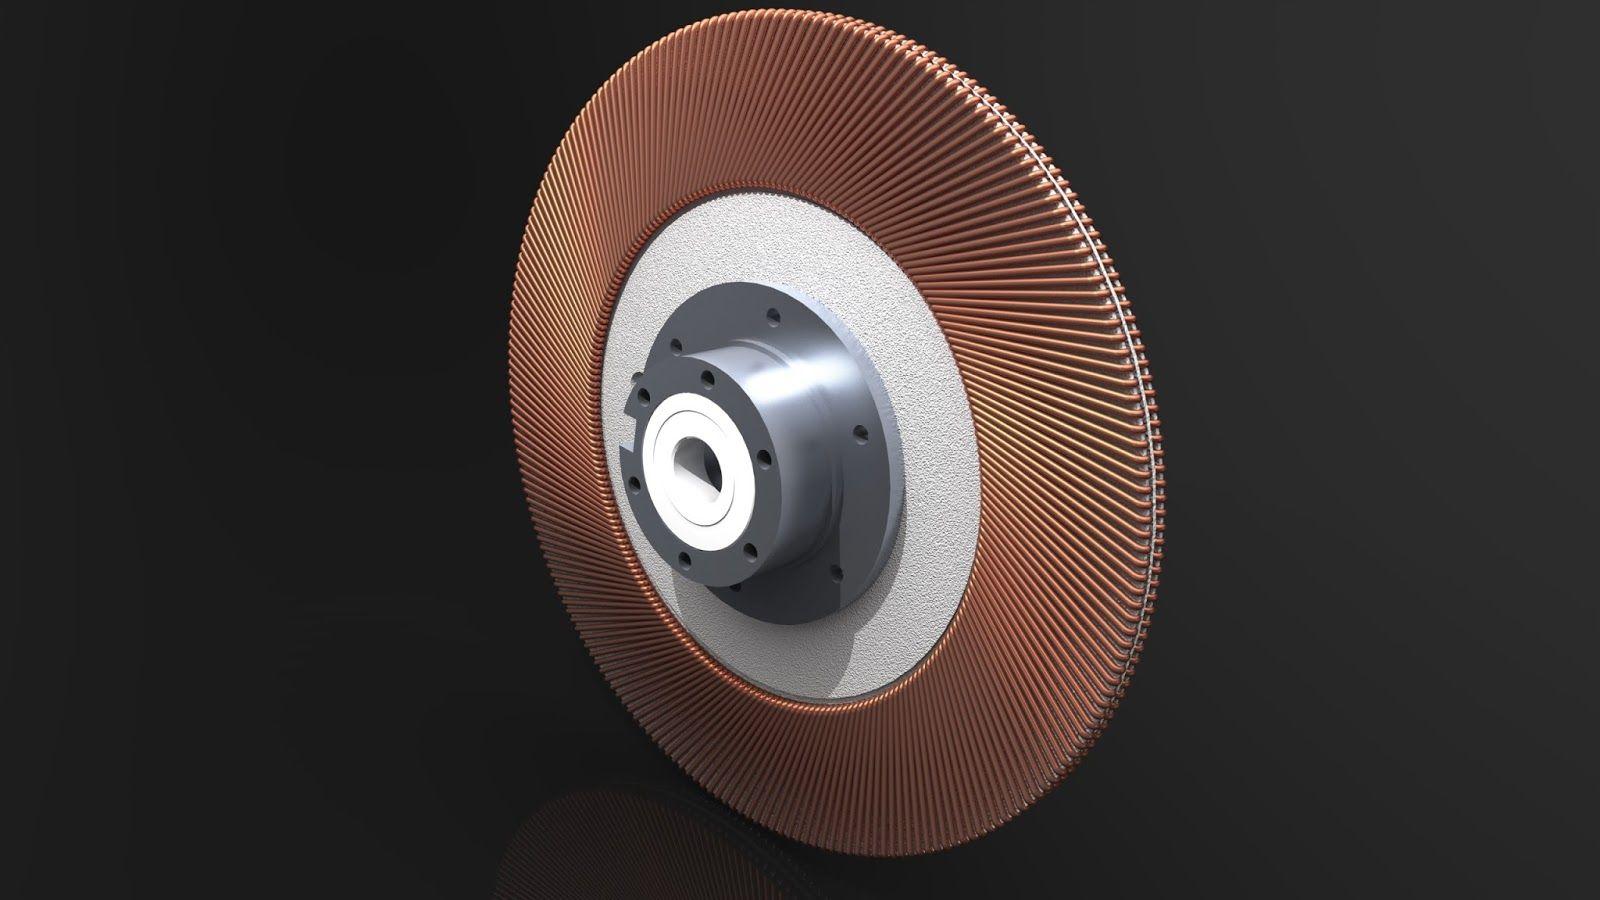 BuildIts in Progress: Coreless Axial Flux Motors | VTT Green Power